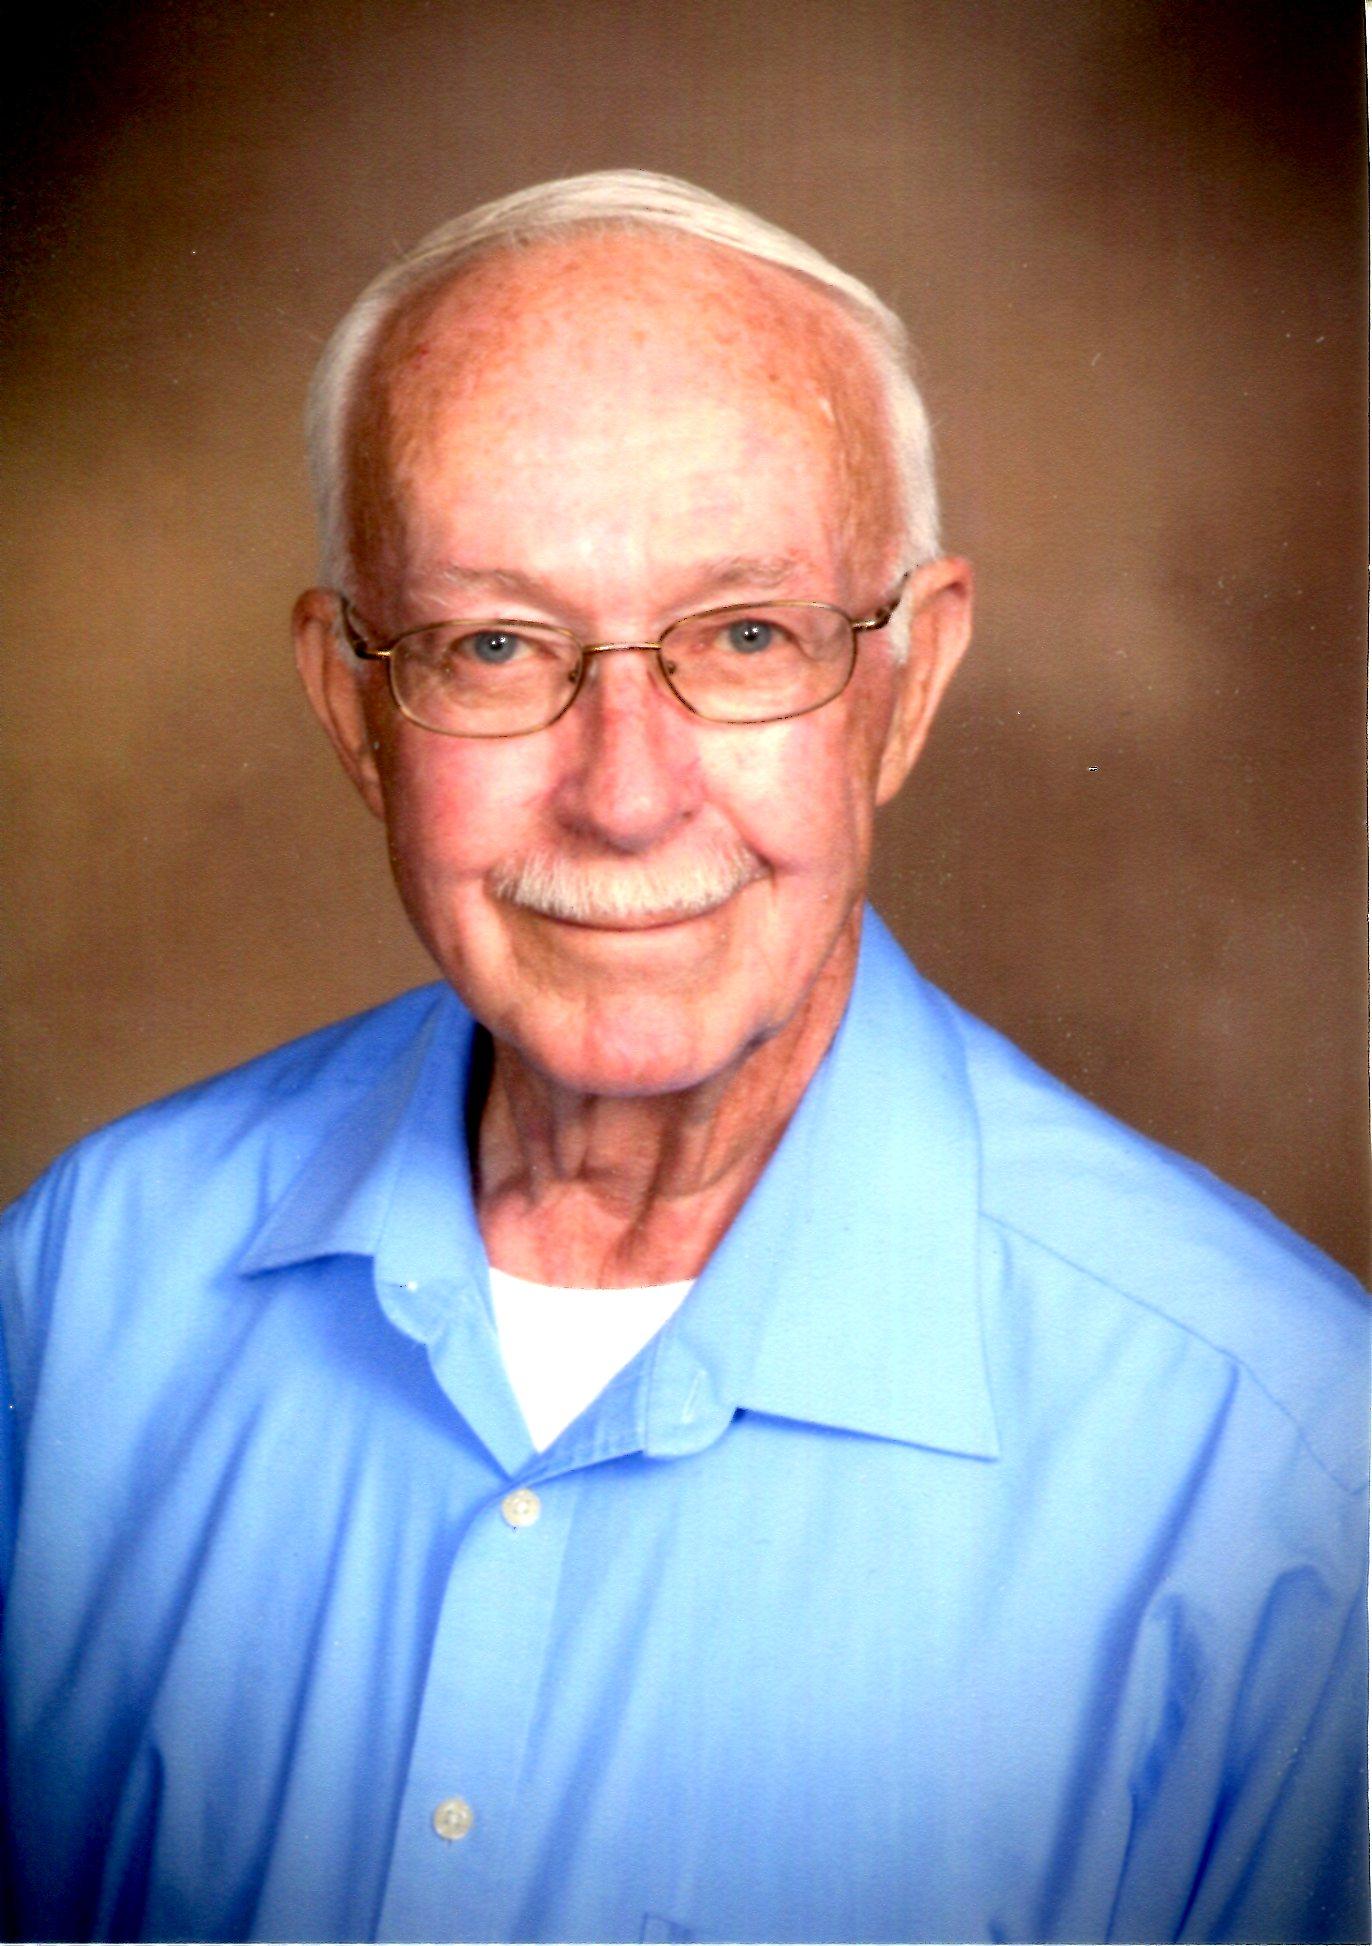 Richard V. Osnes, 81, Scottsbluff